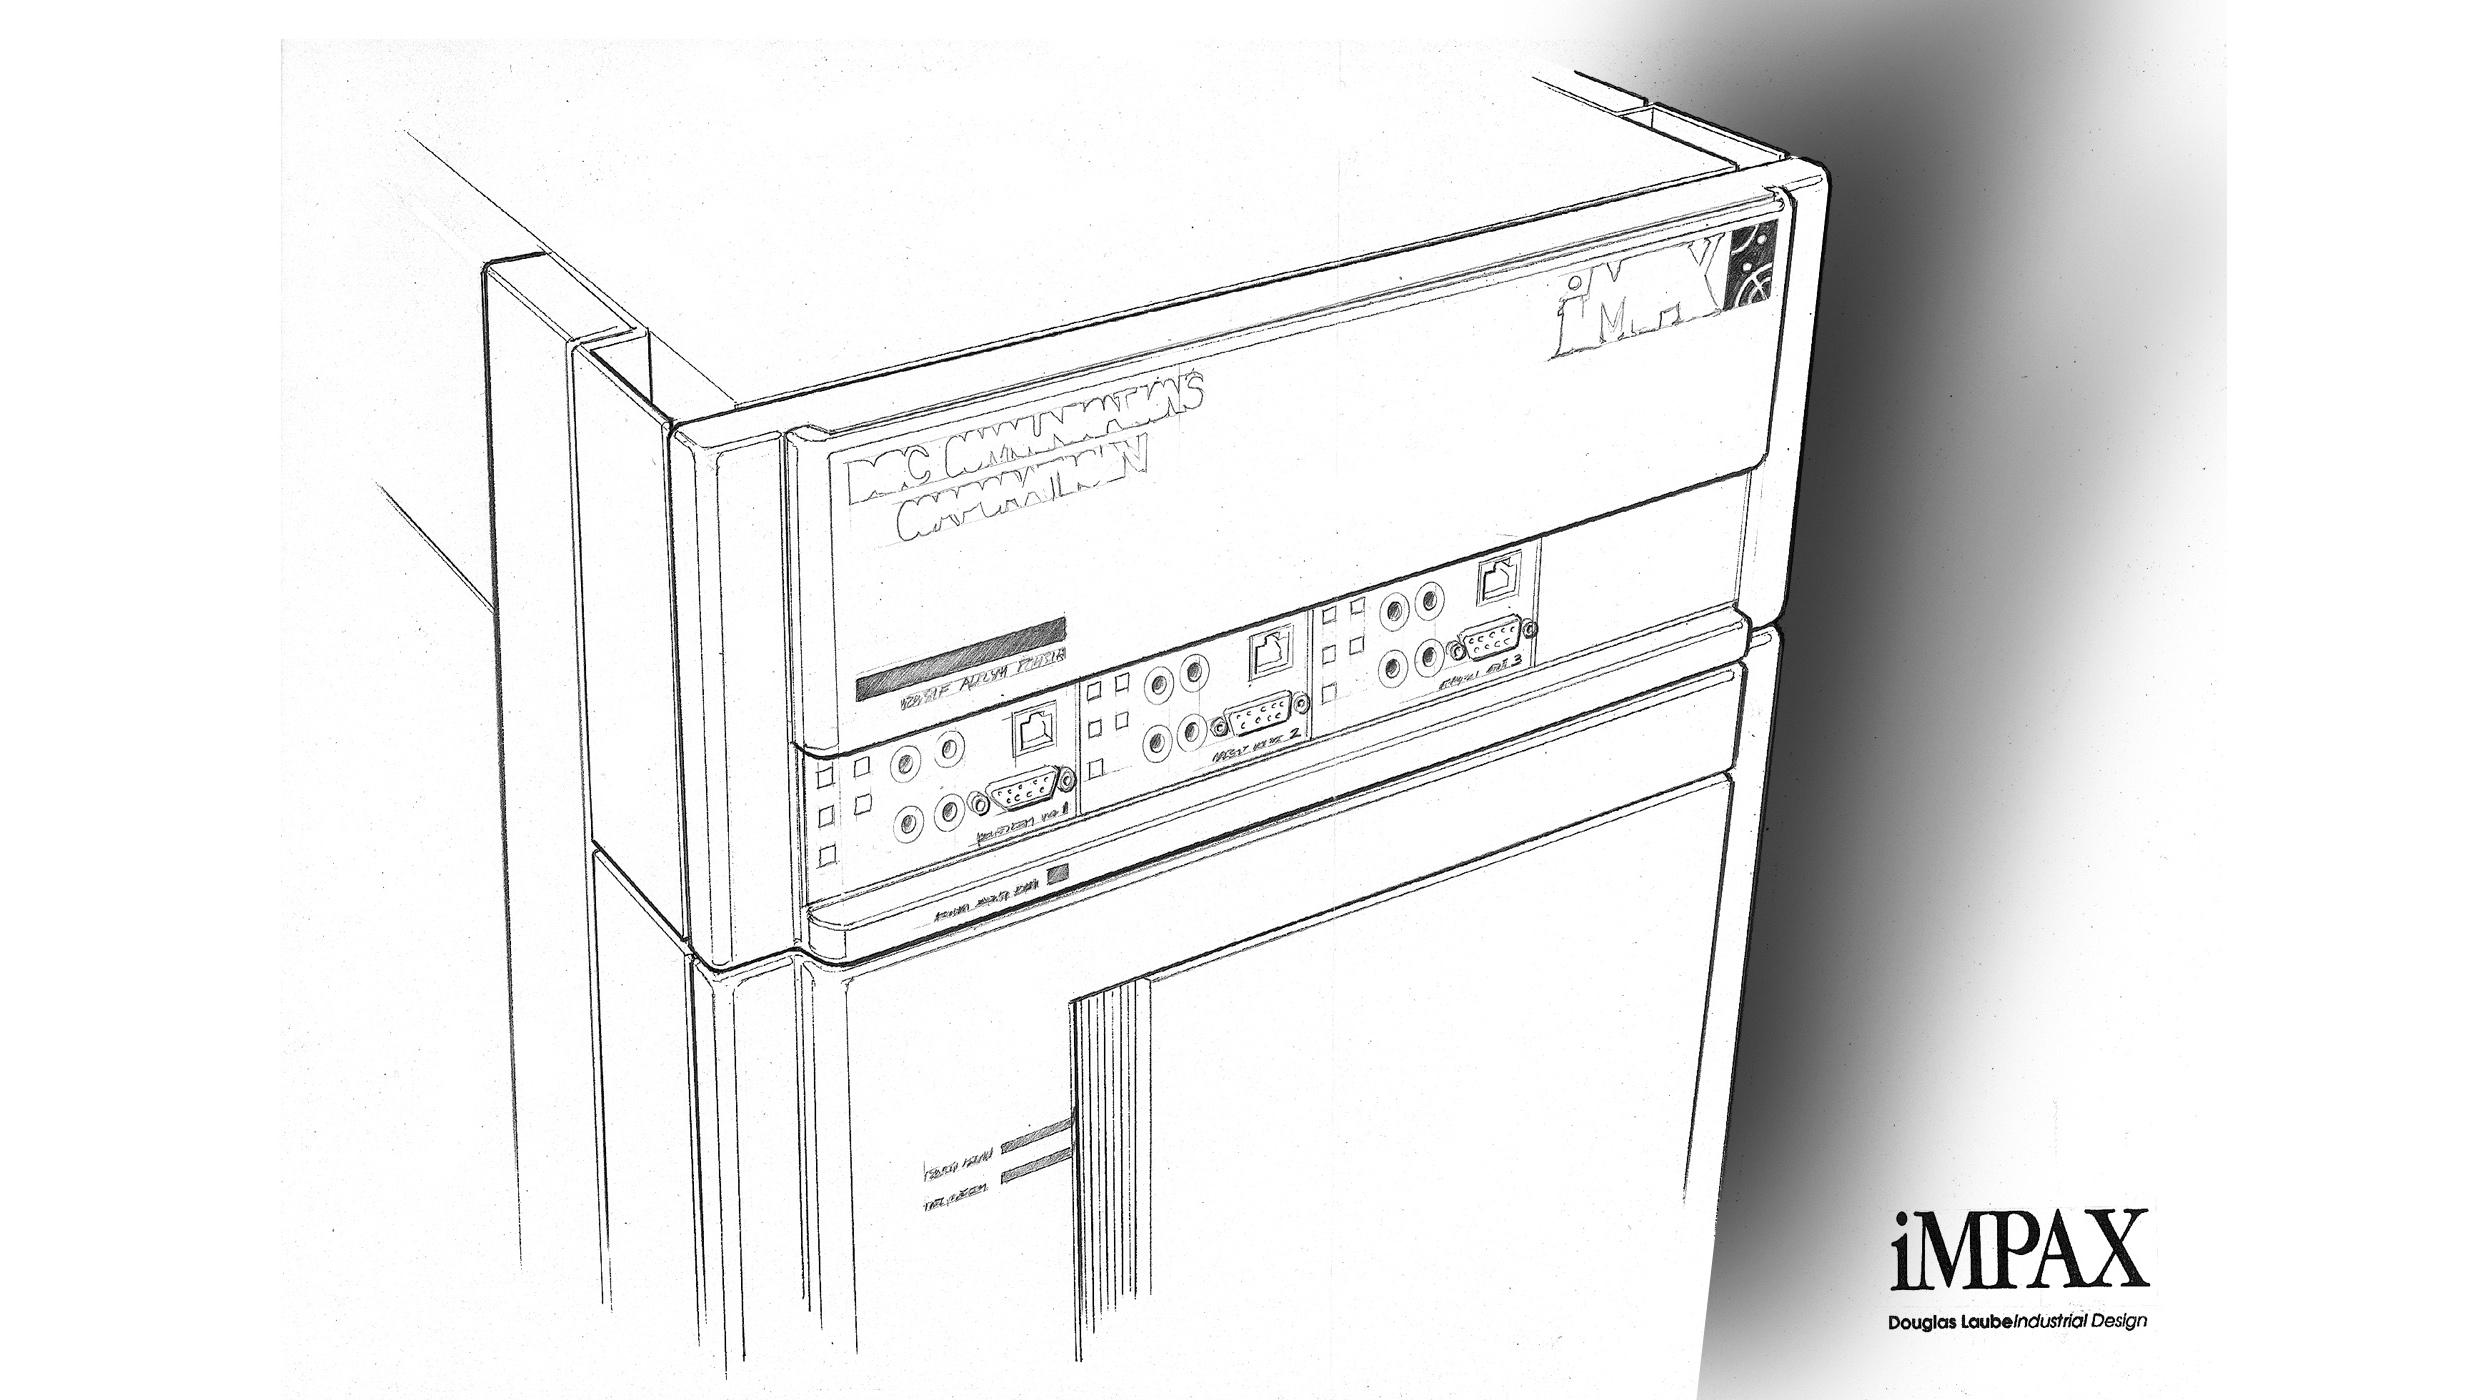 DSC impax sketch.jpg